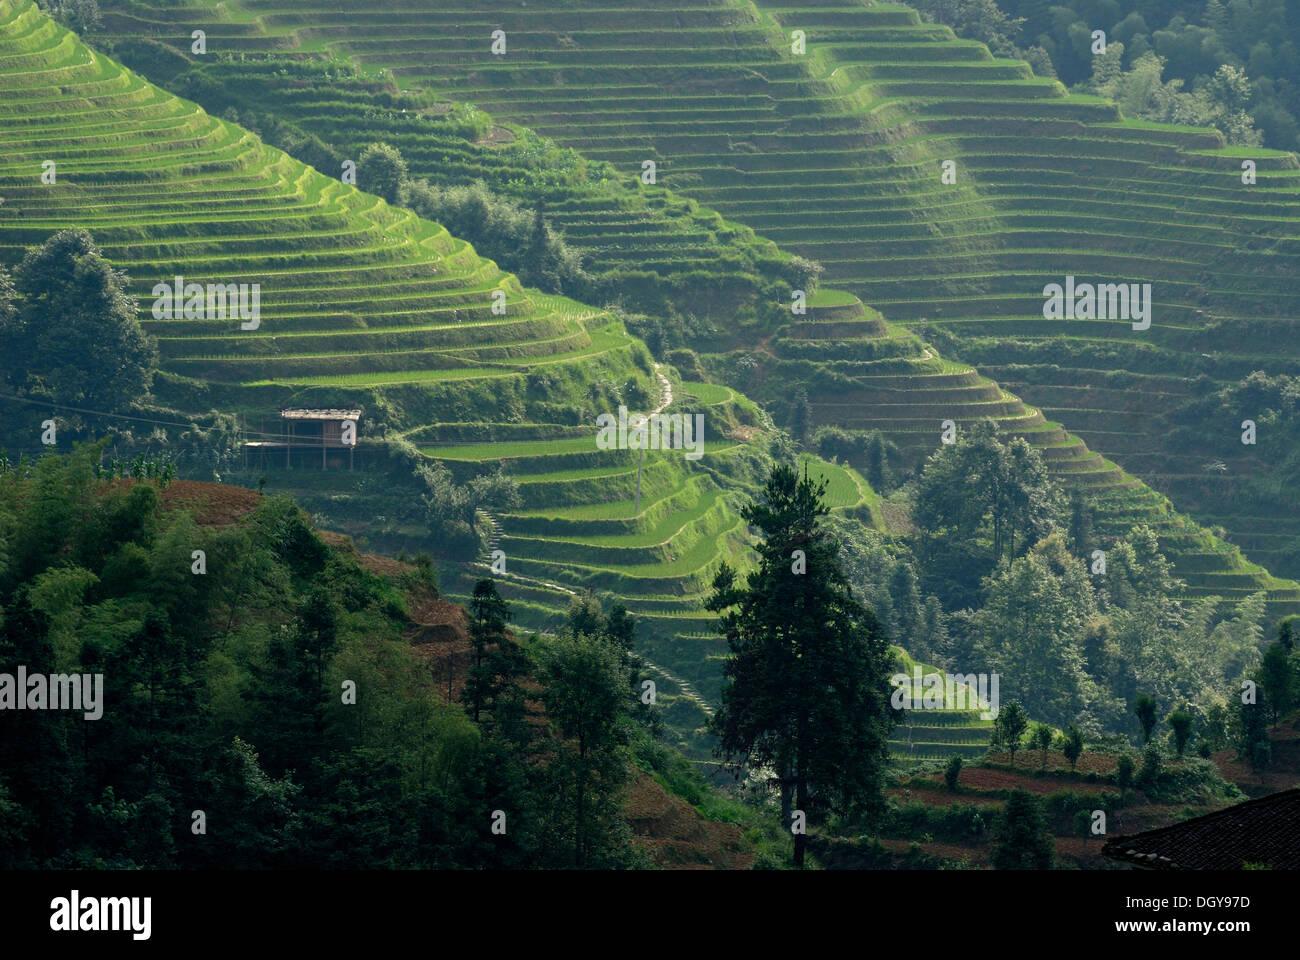 The world-famous rice terraces of Longji 'Backbone of the Dragon' or 'Vertebra of the Dragon' for paddy cultivation, Dazhai - Stock Image